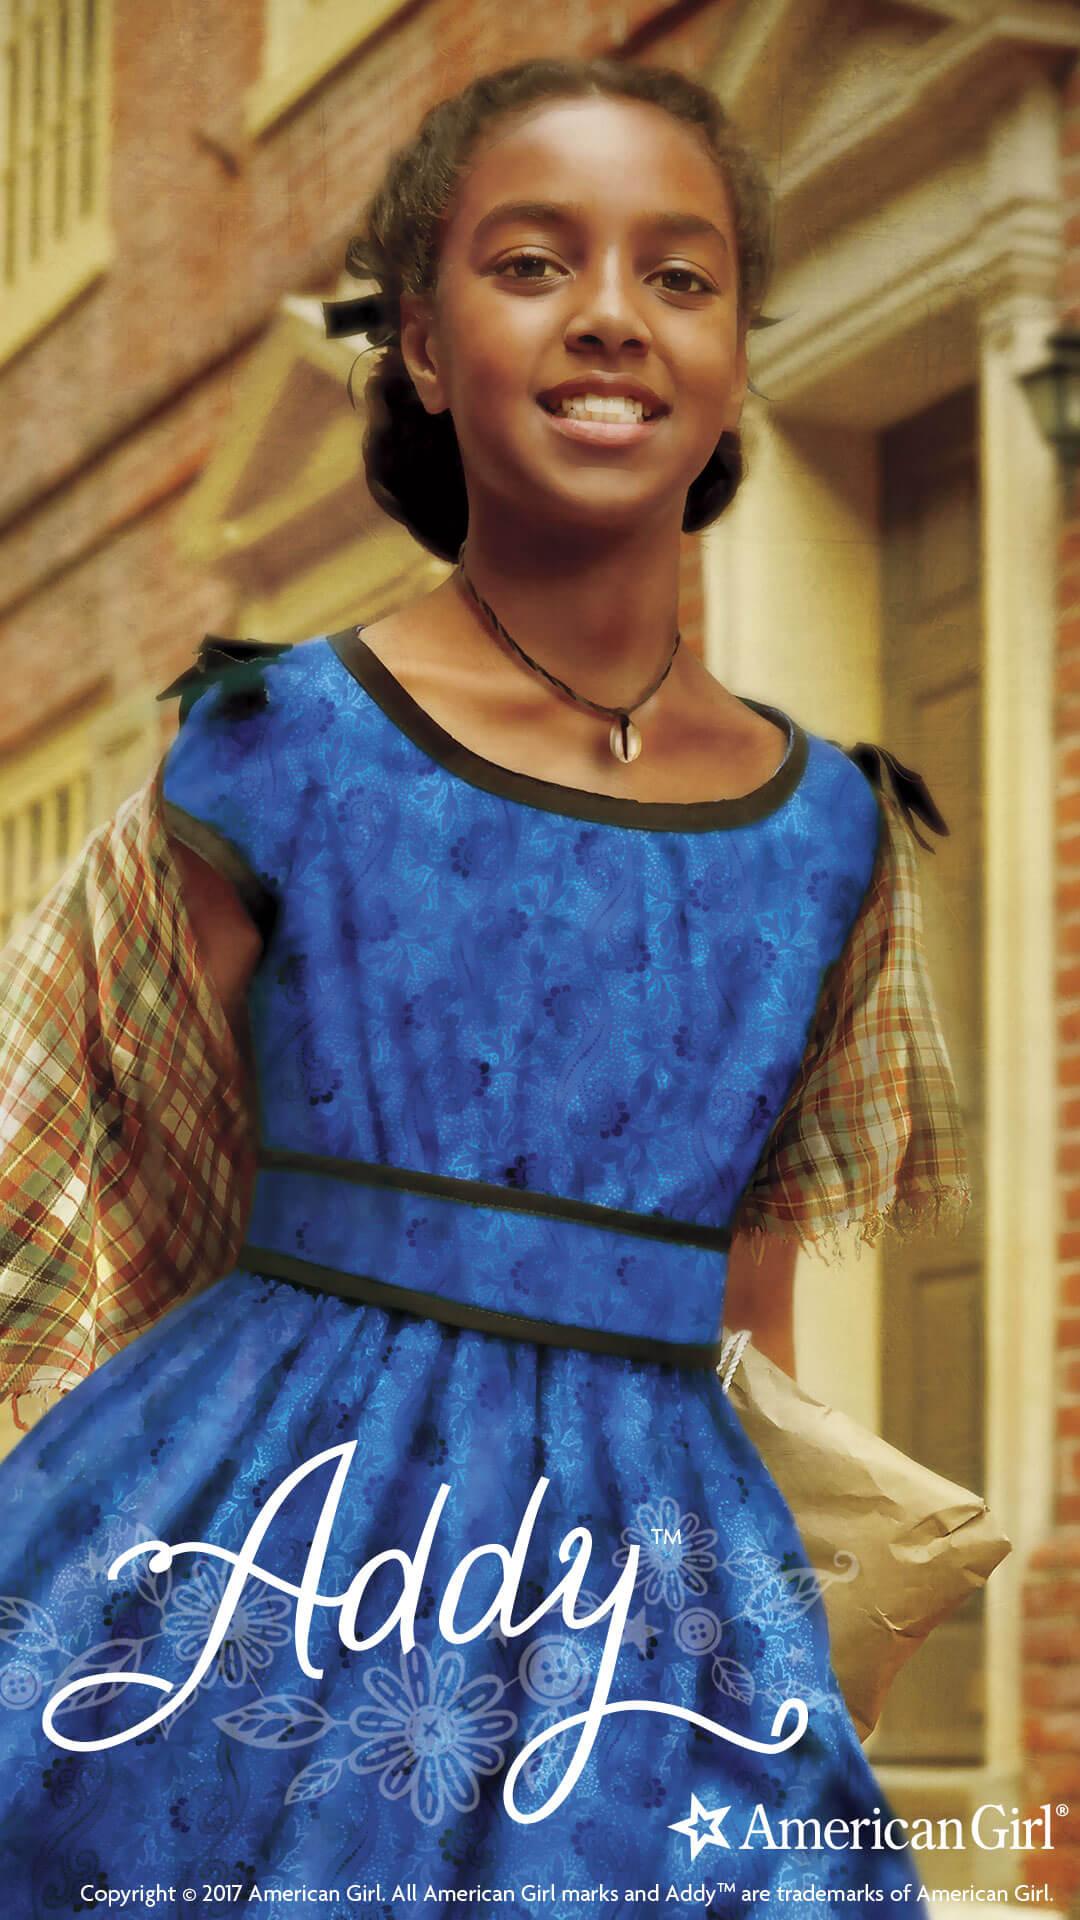 American Girl S New Nasa Advised Doll Is Aspiring: Play At American Girl